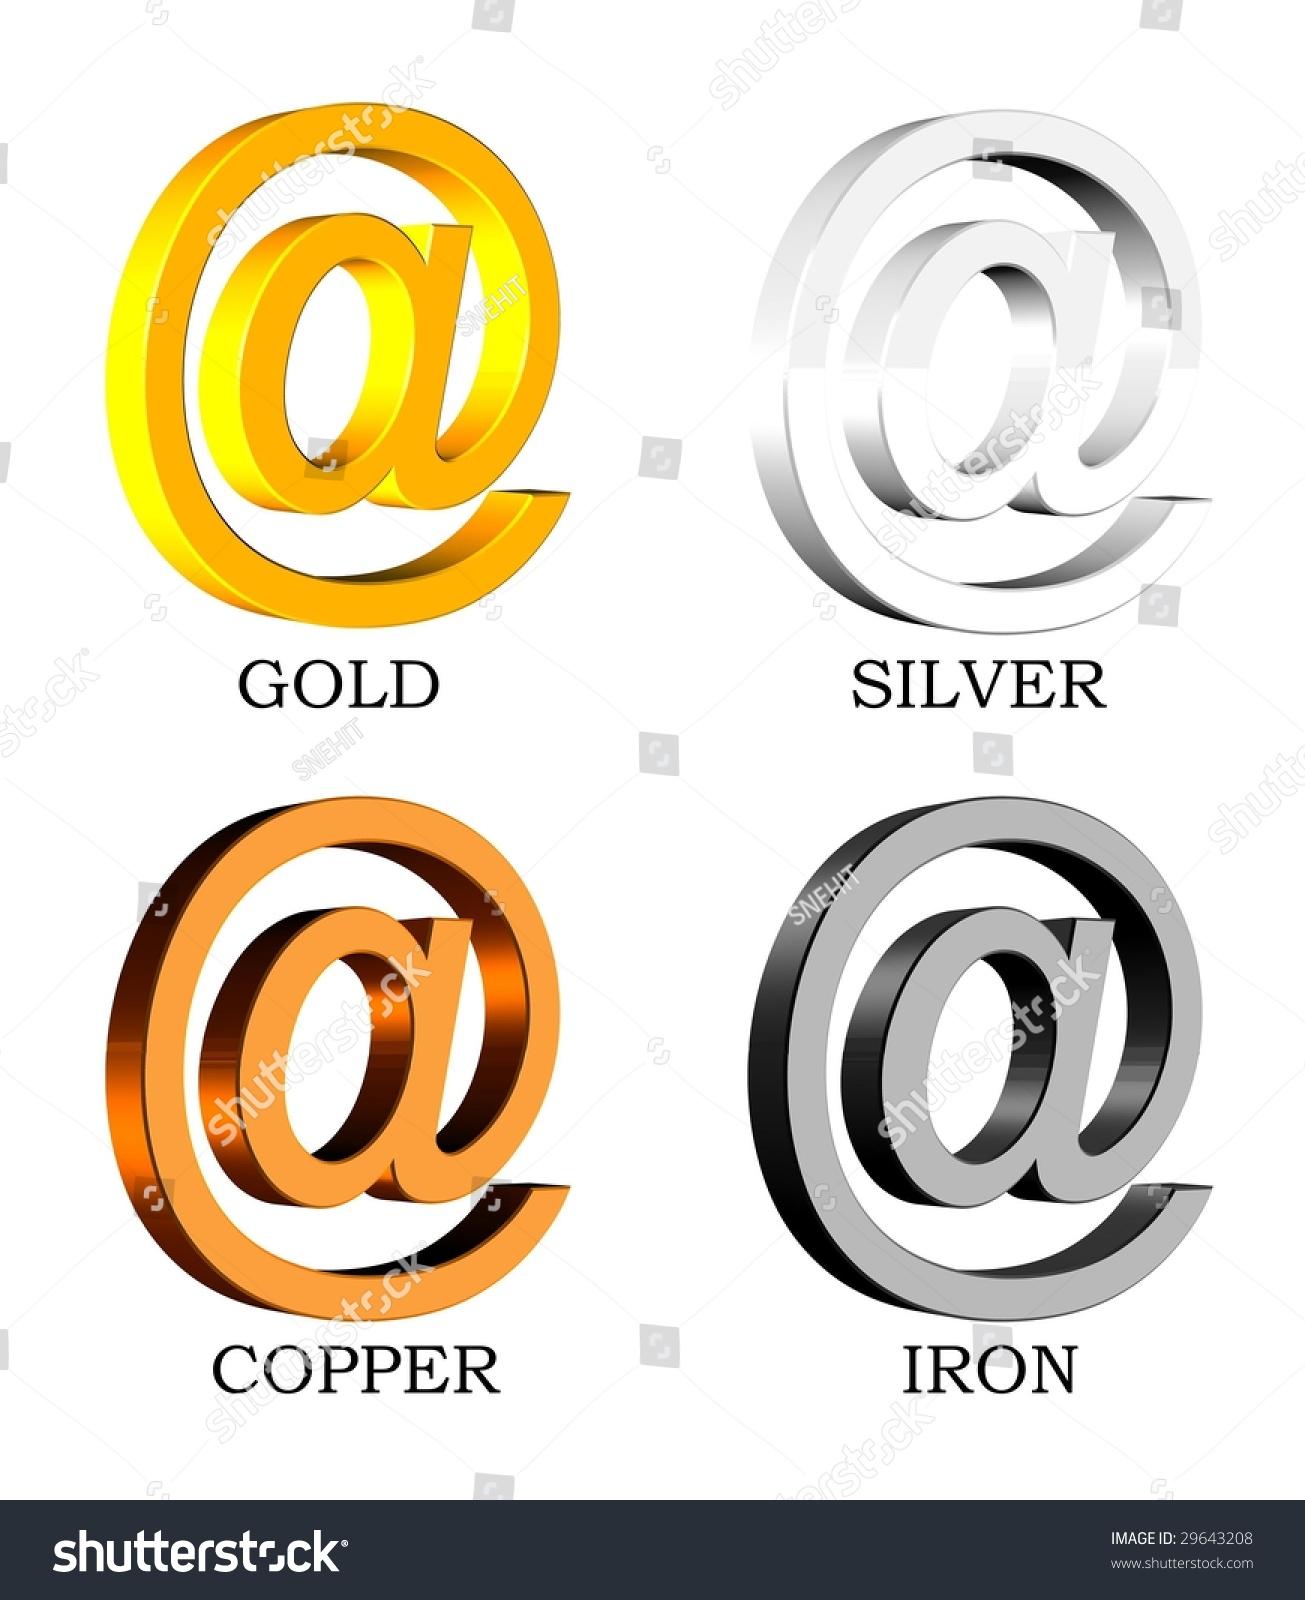 3 D Symbols Gold Silvercopper Iron Metals Stock Illustration